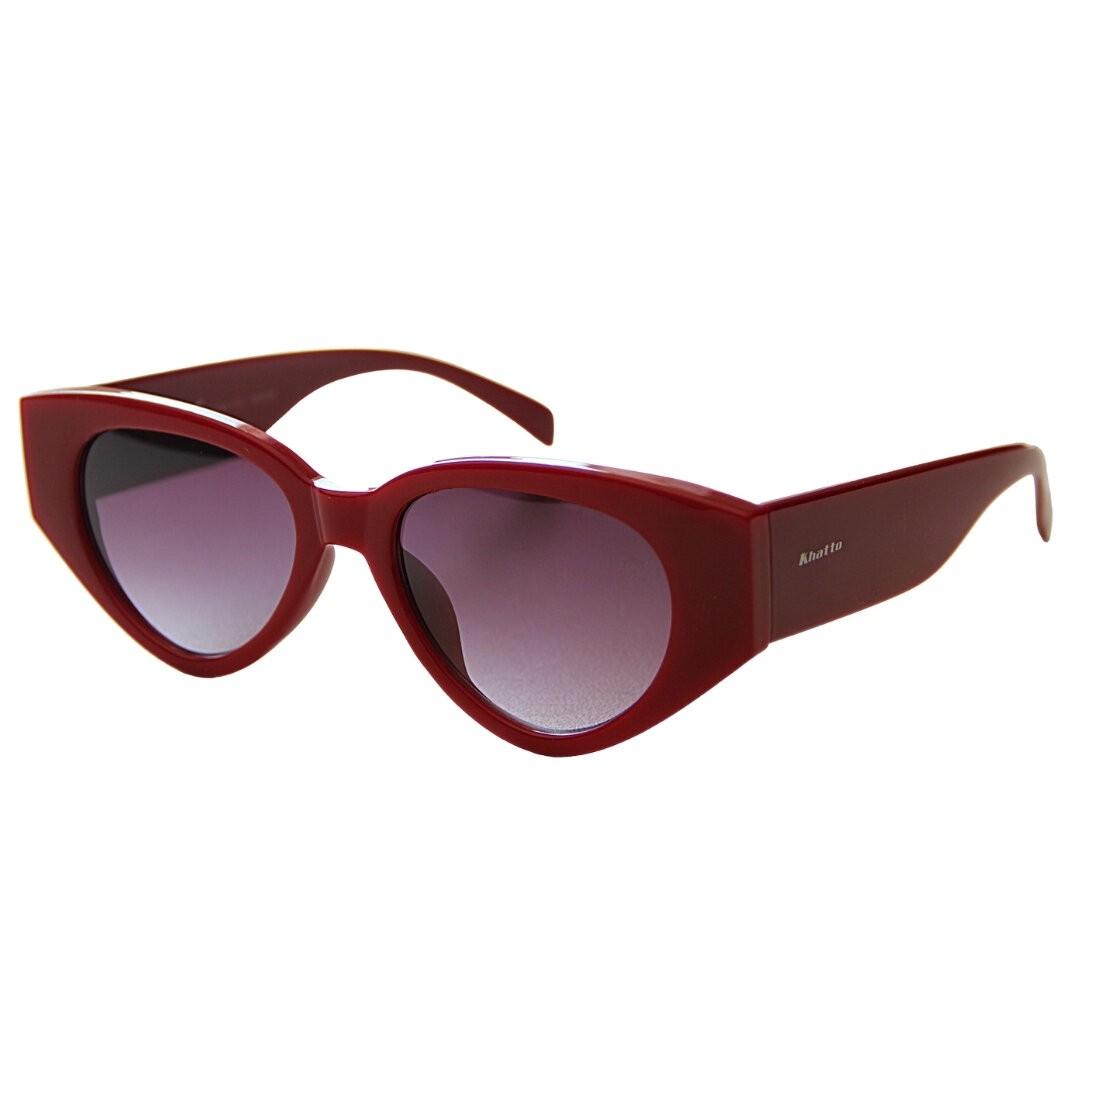 Óculos de Sol Khatto Cat Fashion Moda Italiano - C001